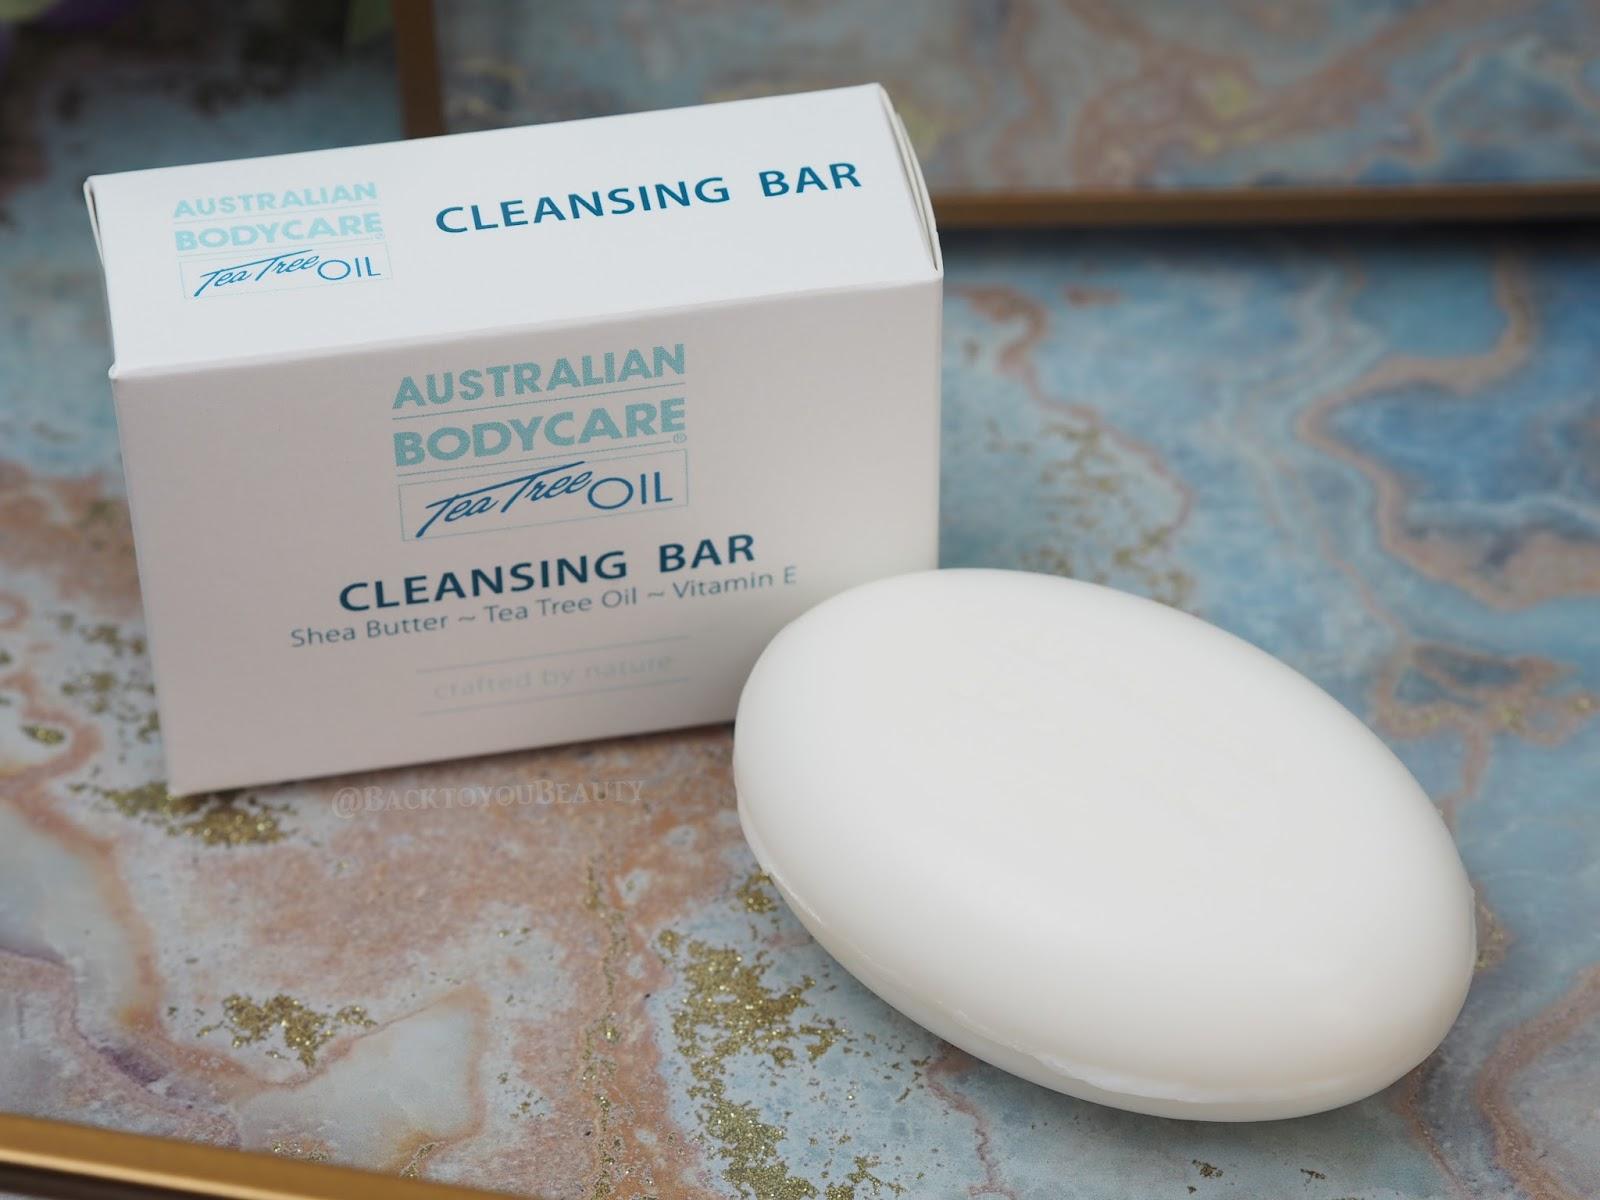 Australian Bodycare Cleansing Bar